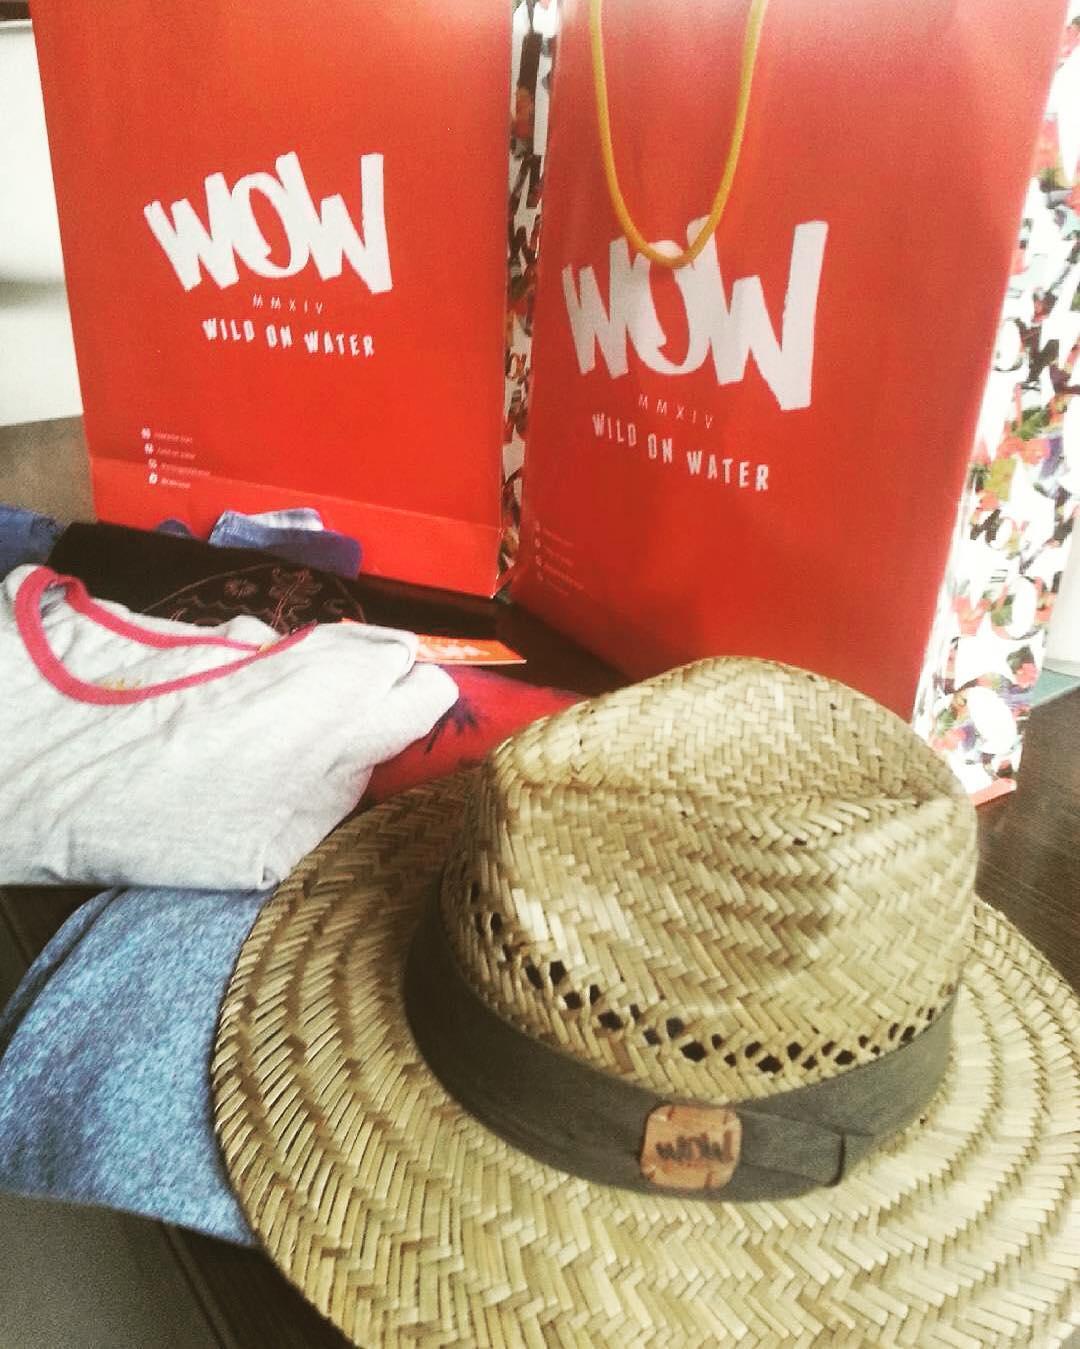 Todavía no viviste la experiencia #WOW? Veni a las Lomas de San Isidro y conócenos. Intendente Tomkinson 2970 #lifeiswow  #WildOnWater #livingwow #livewildonwater